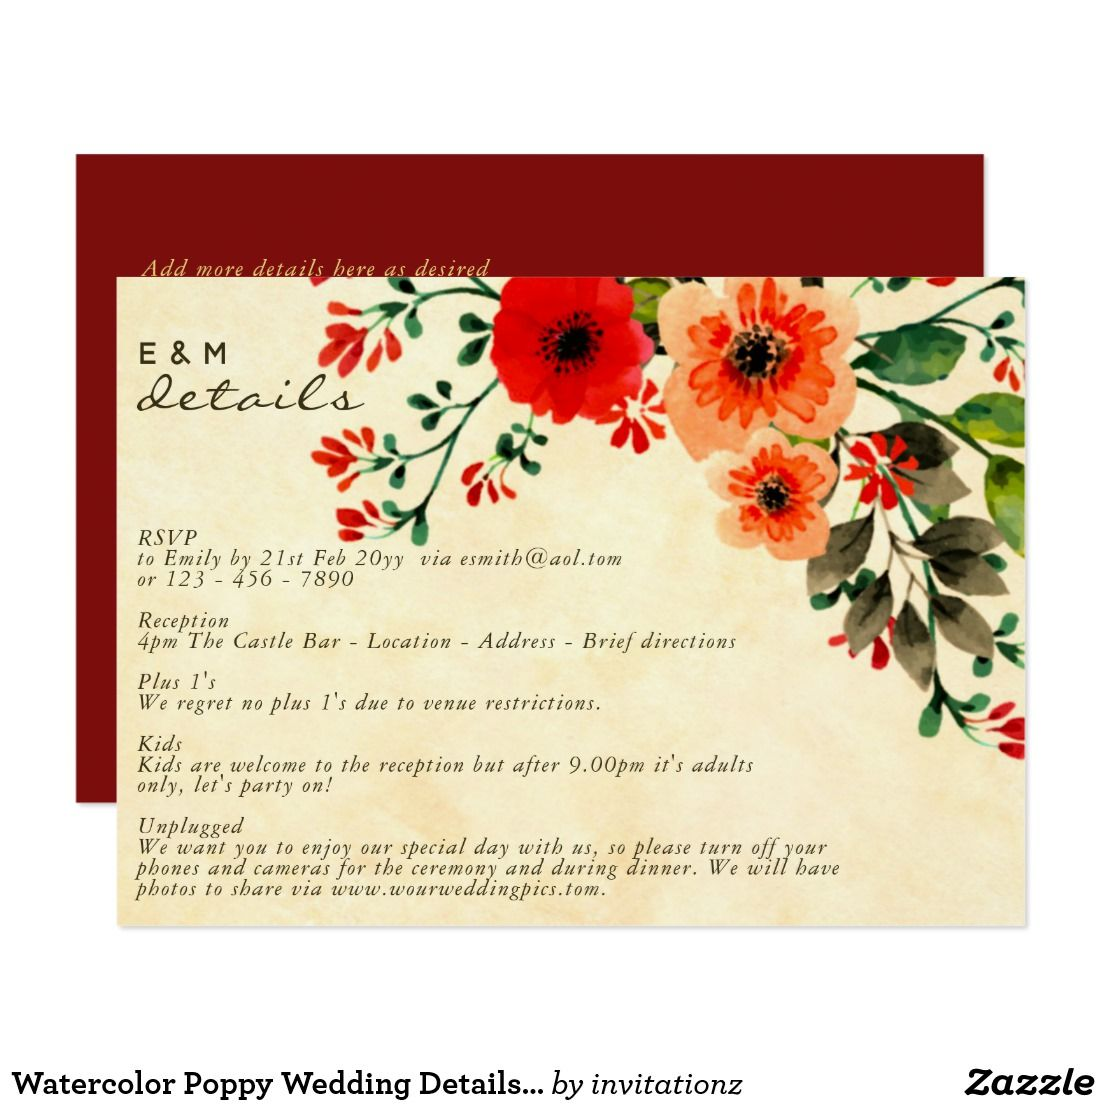 Watercolor Poppy Wedding Details Program Card | Watercolor poppies ...